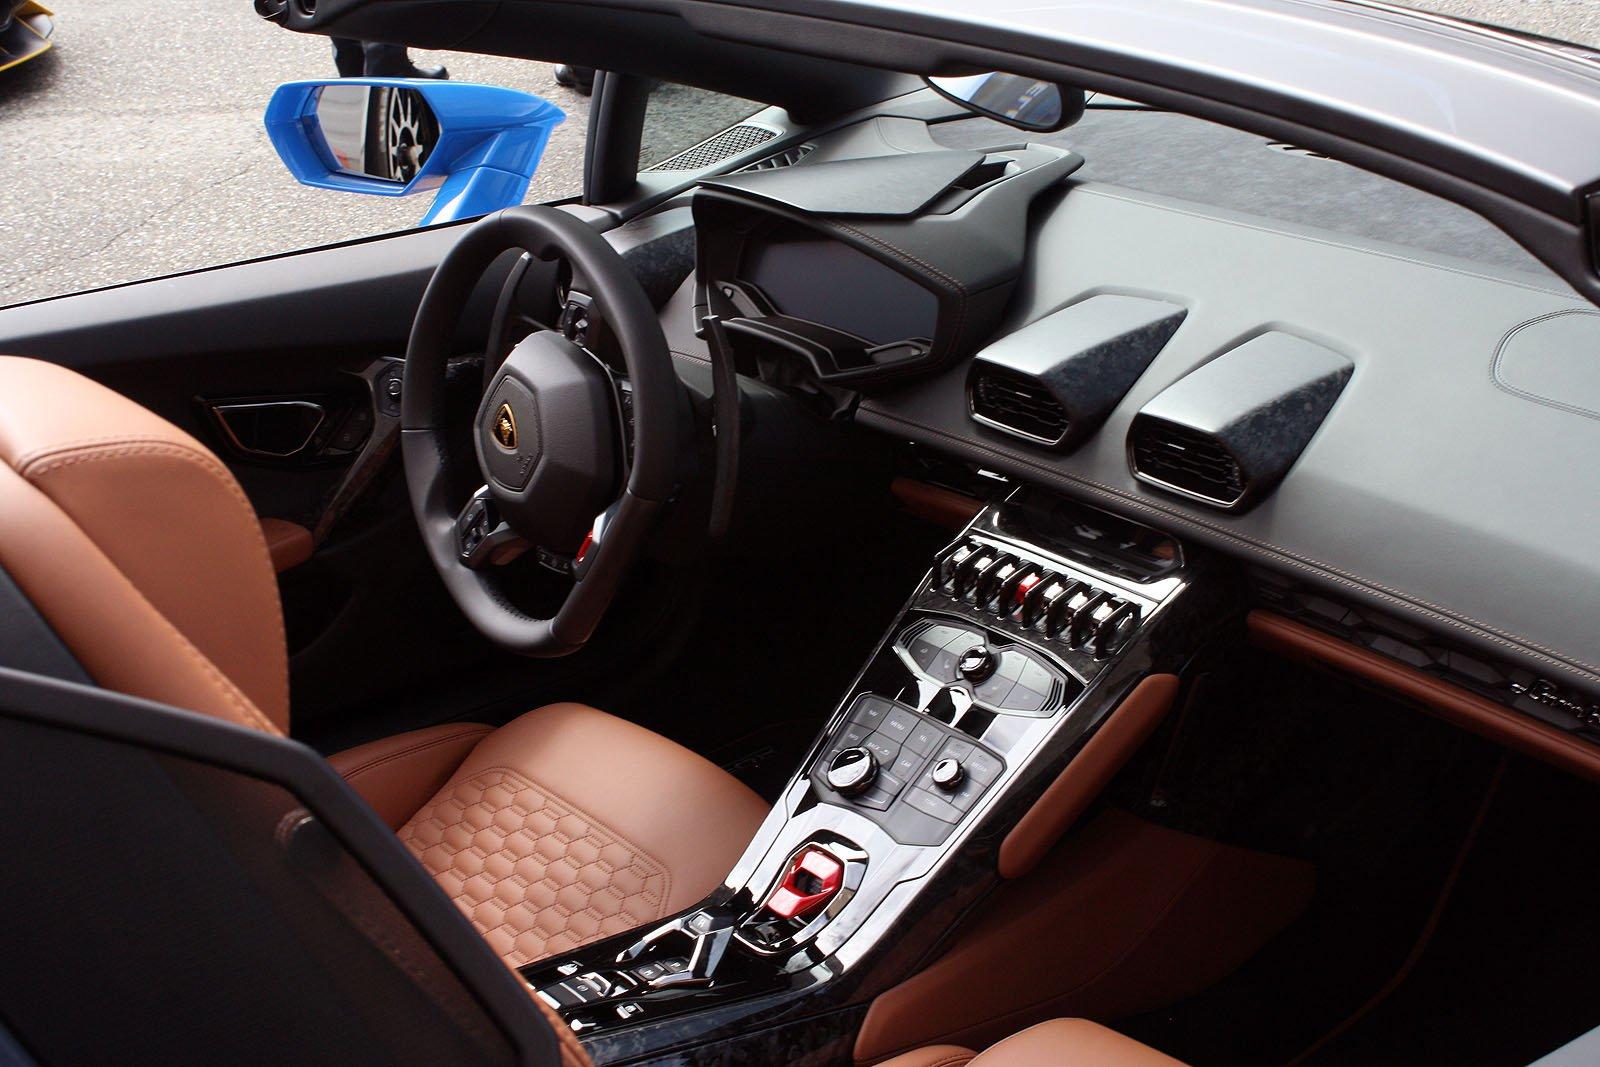 Lamborghini-ACSL-Grand-Opening-46